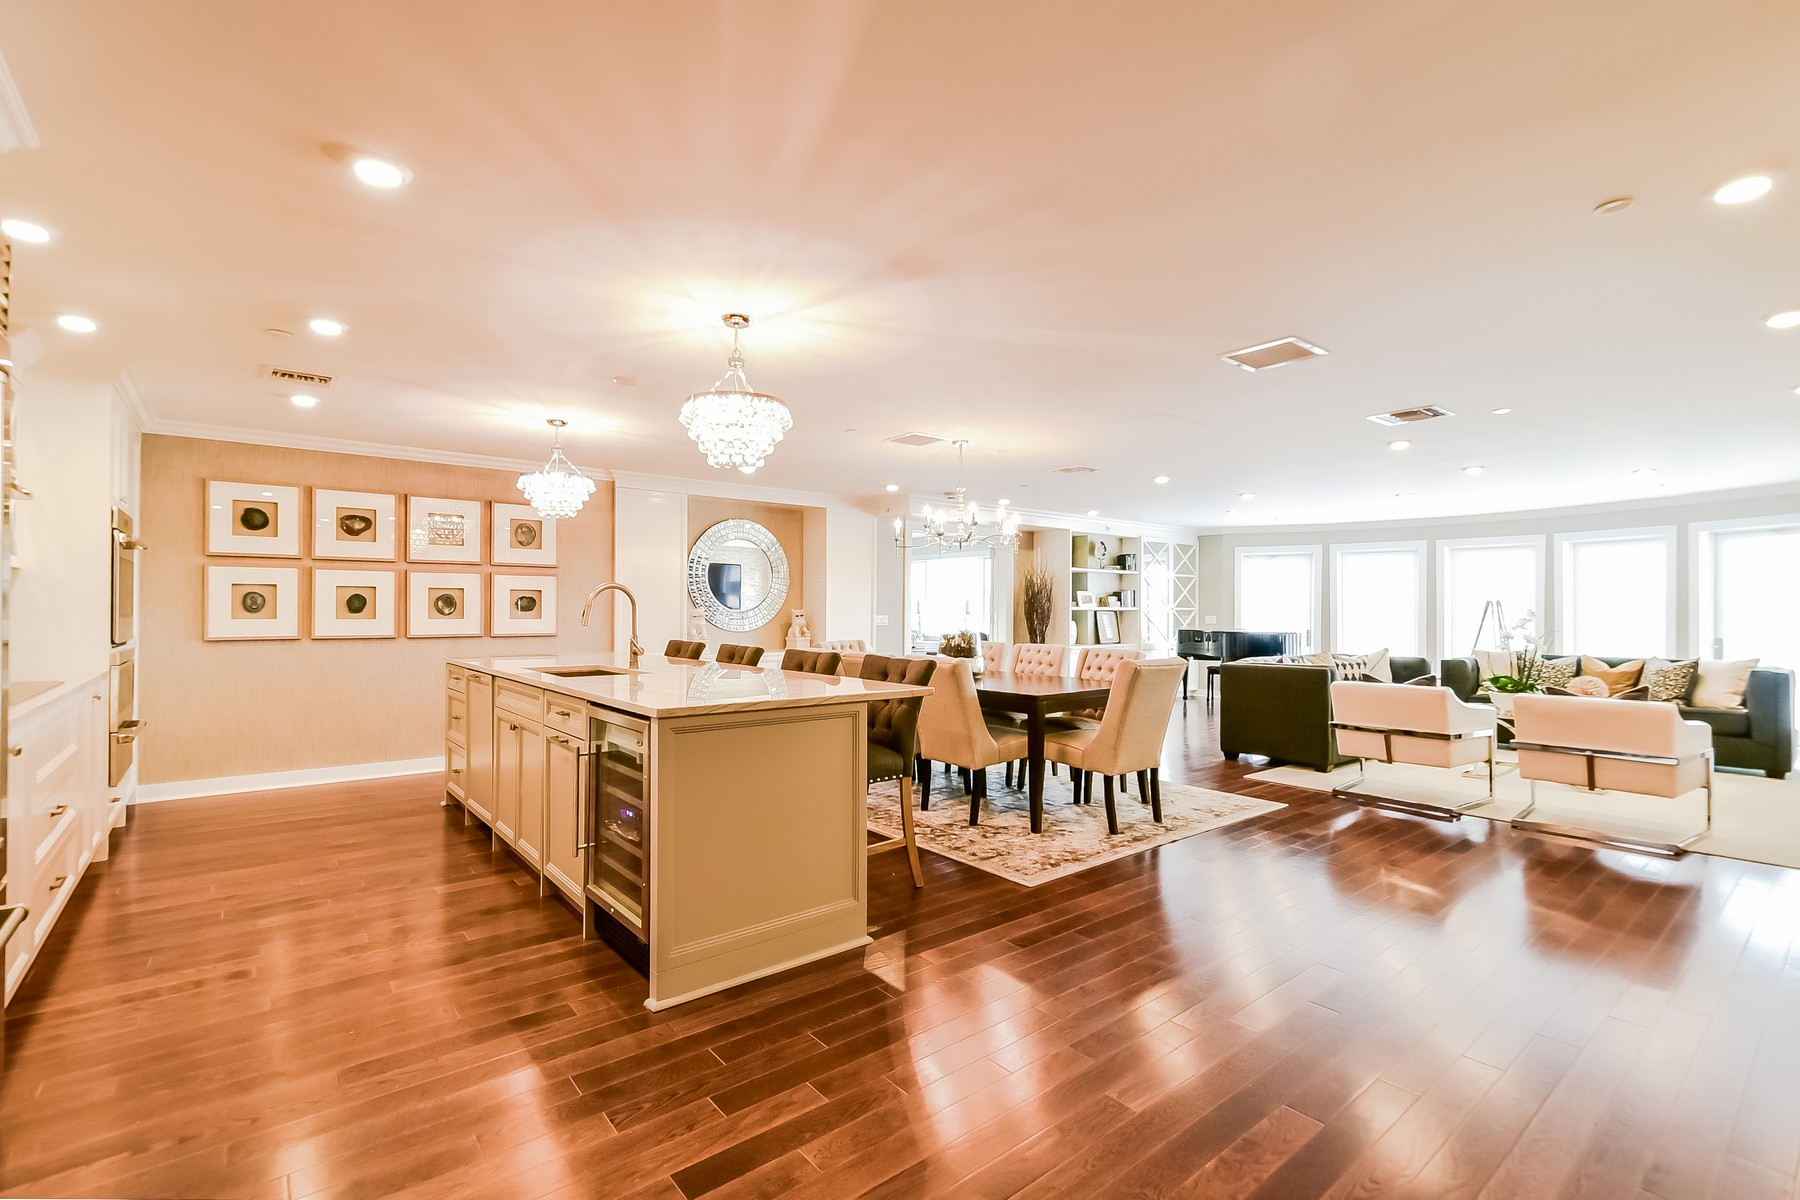 Condominium for Sale at Condo 433 Main St 2 212 Port Washington, New York, 11050 United States